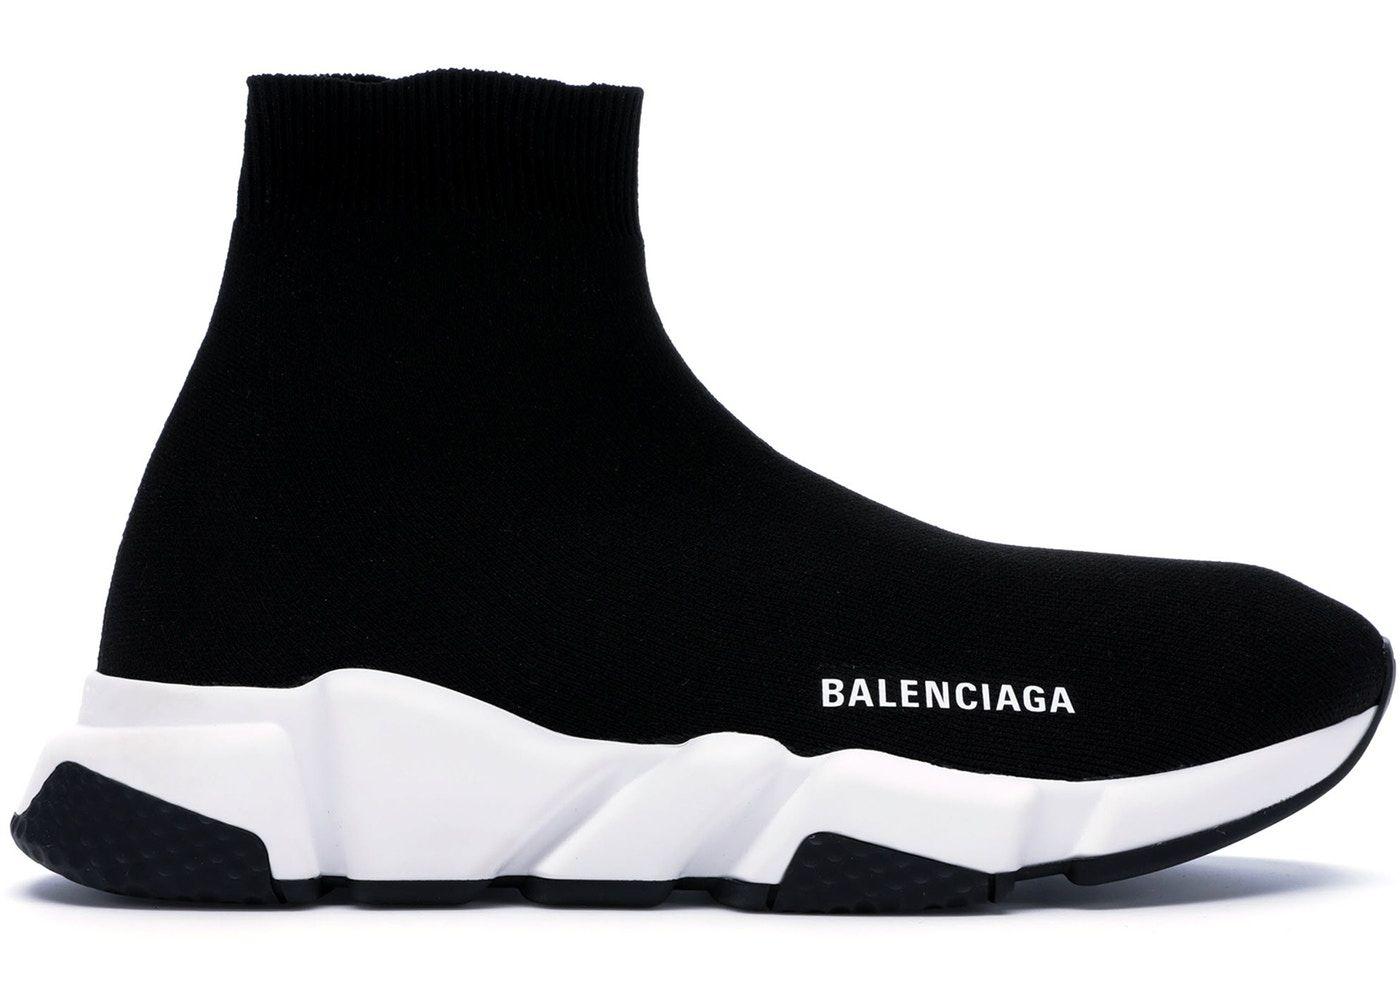 Balenciaga speed trainer, Hype shoes